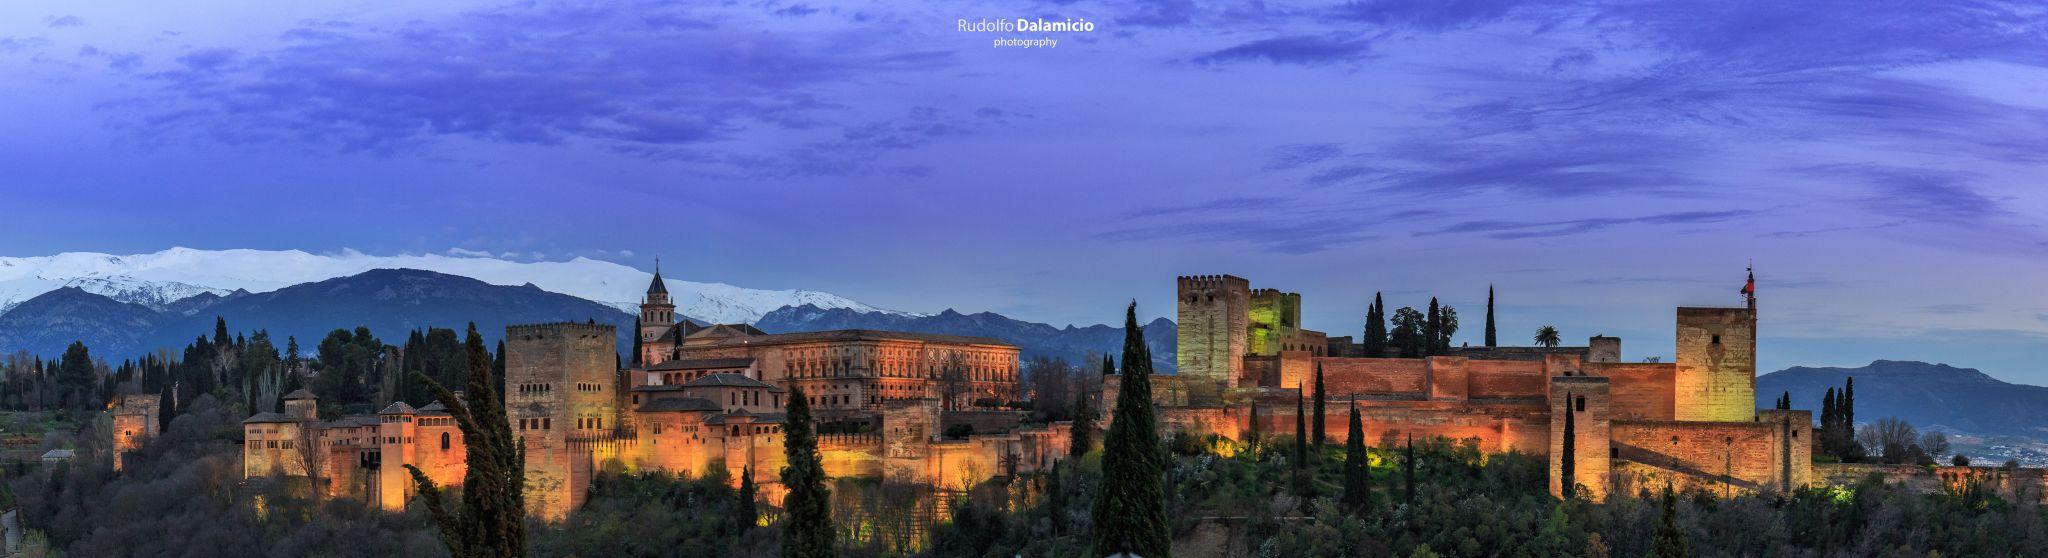 Panorama de Alhambra, Spain